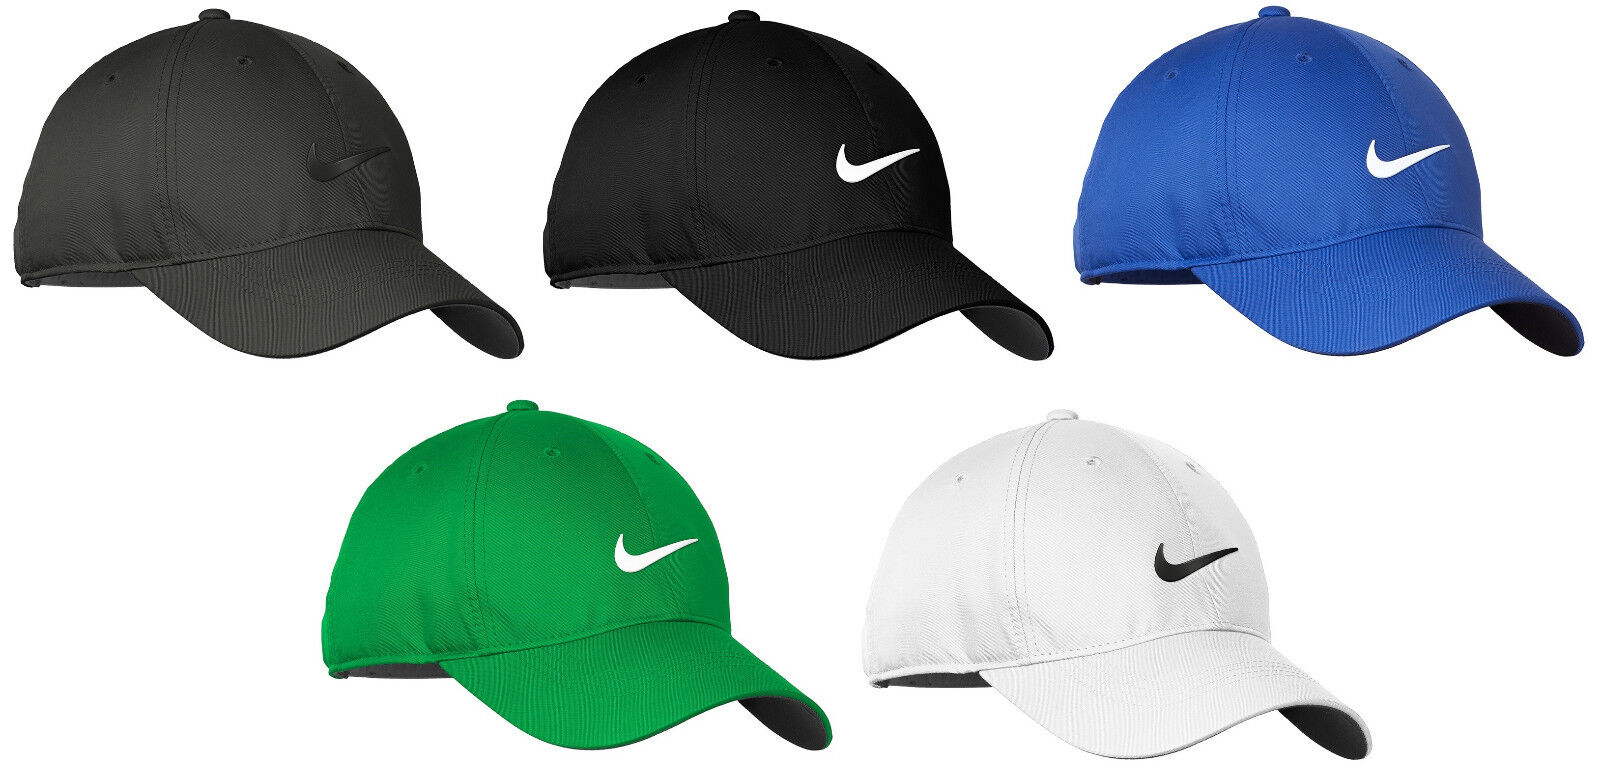 Nike Dri-FIT Swoosh Front Men's Adjustable Strapback Dad Cap Authentic Hat